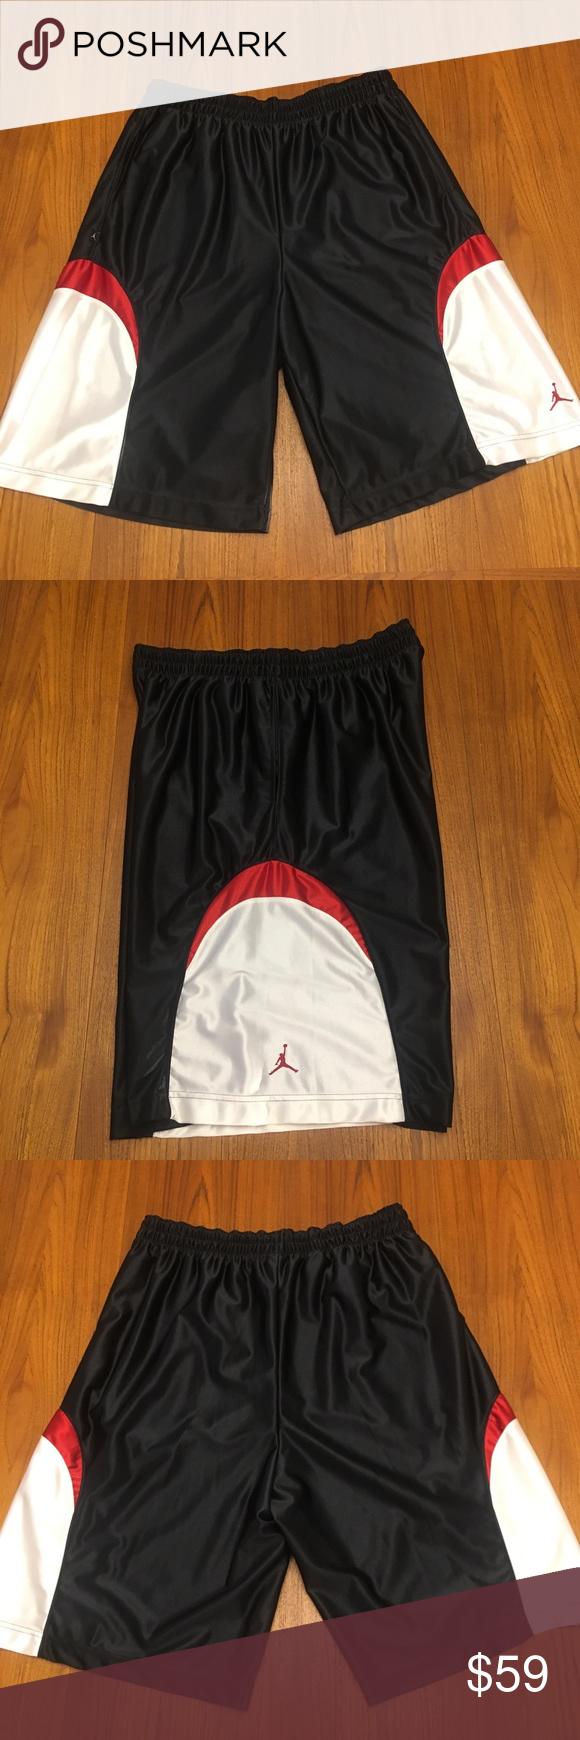 Sold Rare Nwot Vintage Jordan Shorts 2007 Xl Jordan Shorts Vintage Nike Shorts